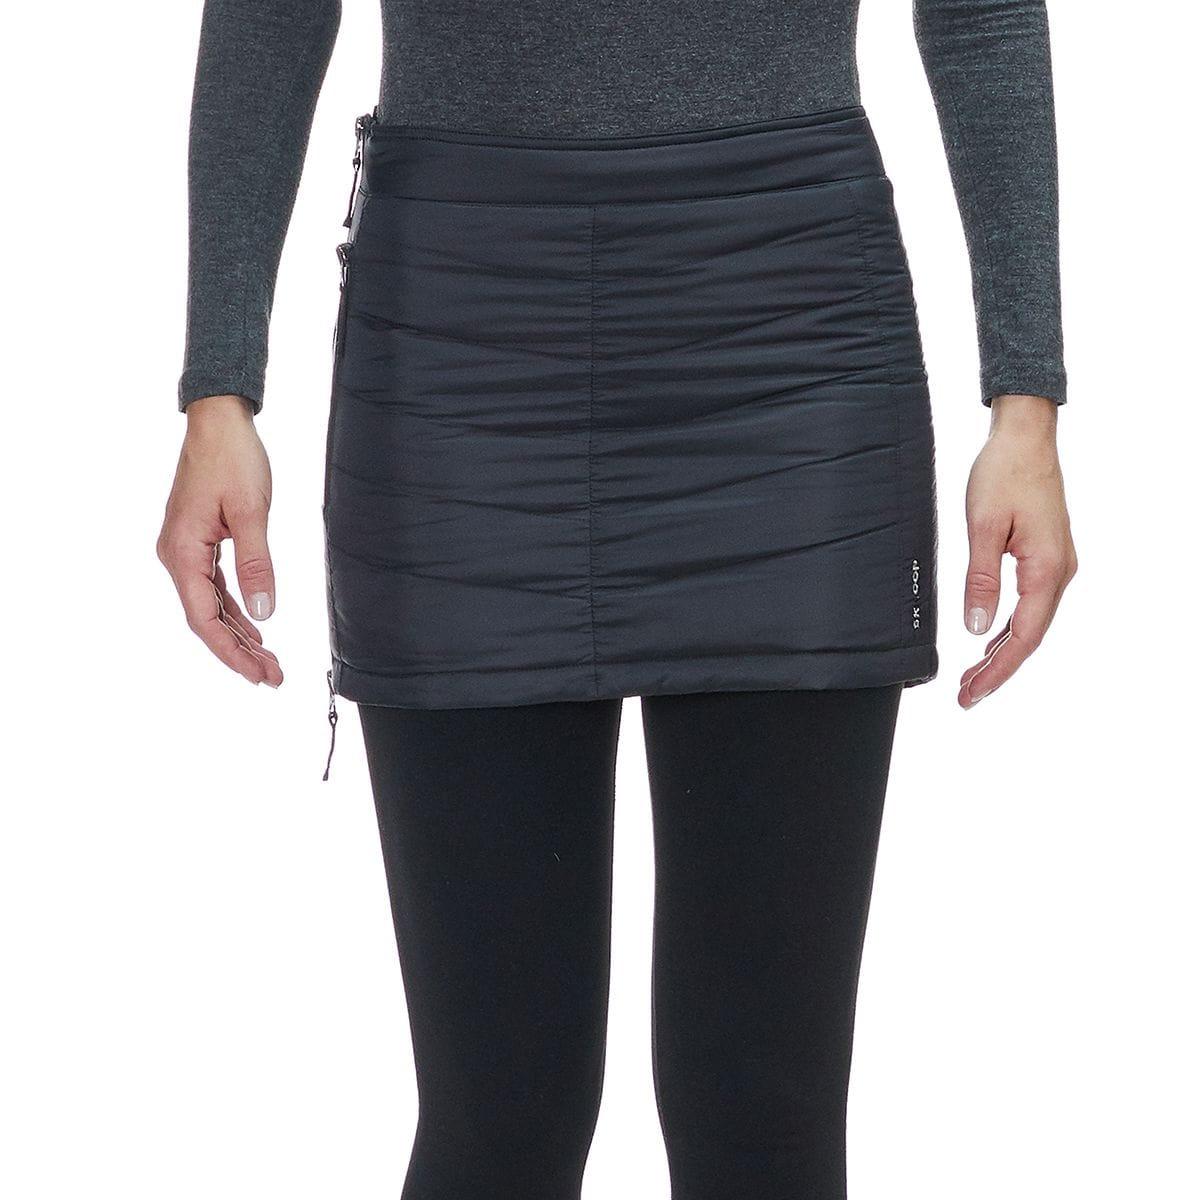 SKHOOP Mini Down Skirt - Women's Black, L OOP0001-BK-L